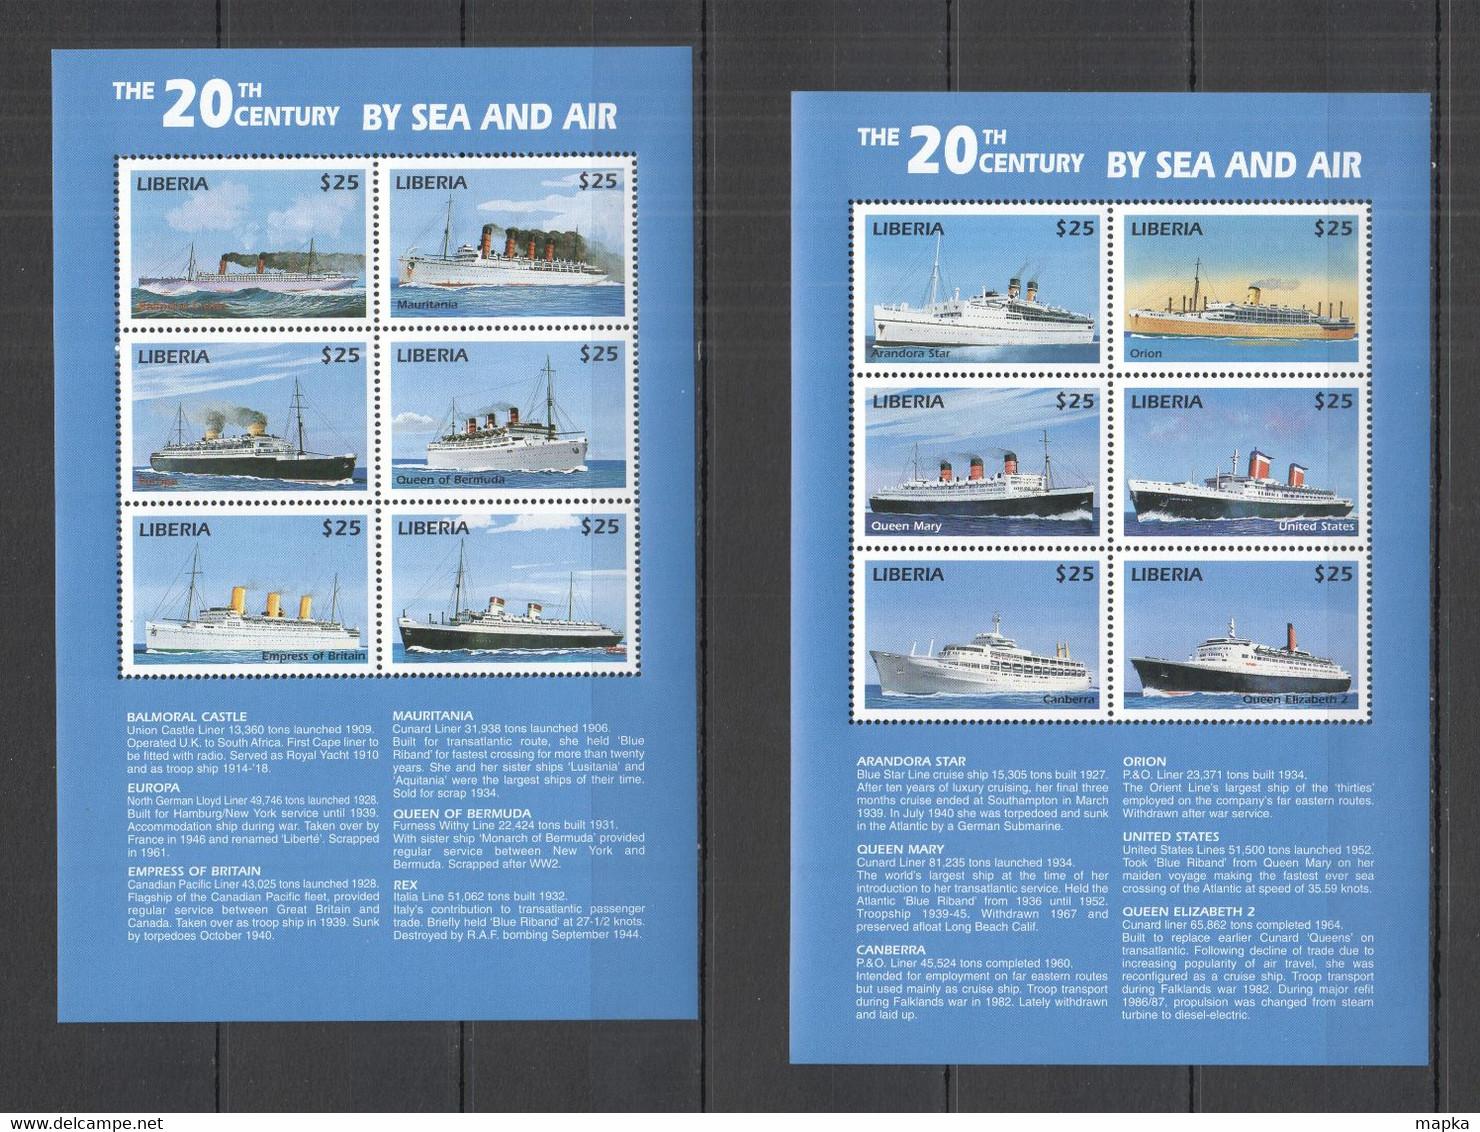 XX516 LIBERIA 20TH CENTURY BY SEA & AIR TRANSPORT SHIPS !!! 2KB MNH - Ships